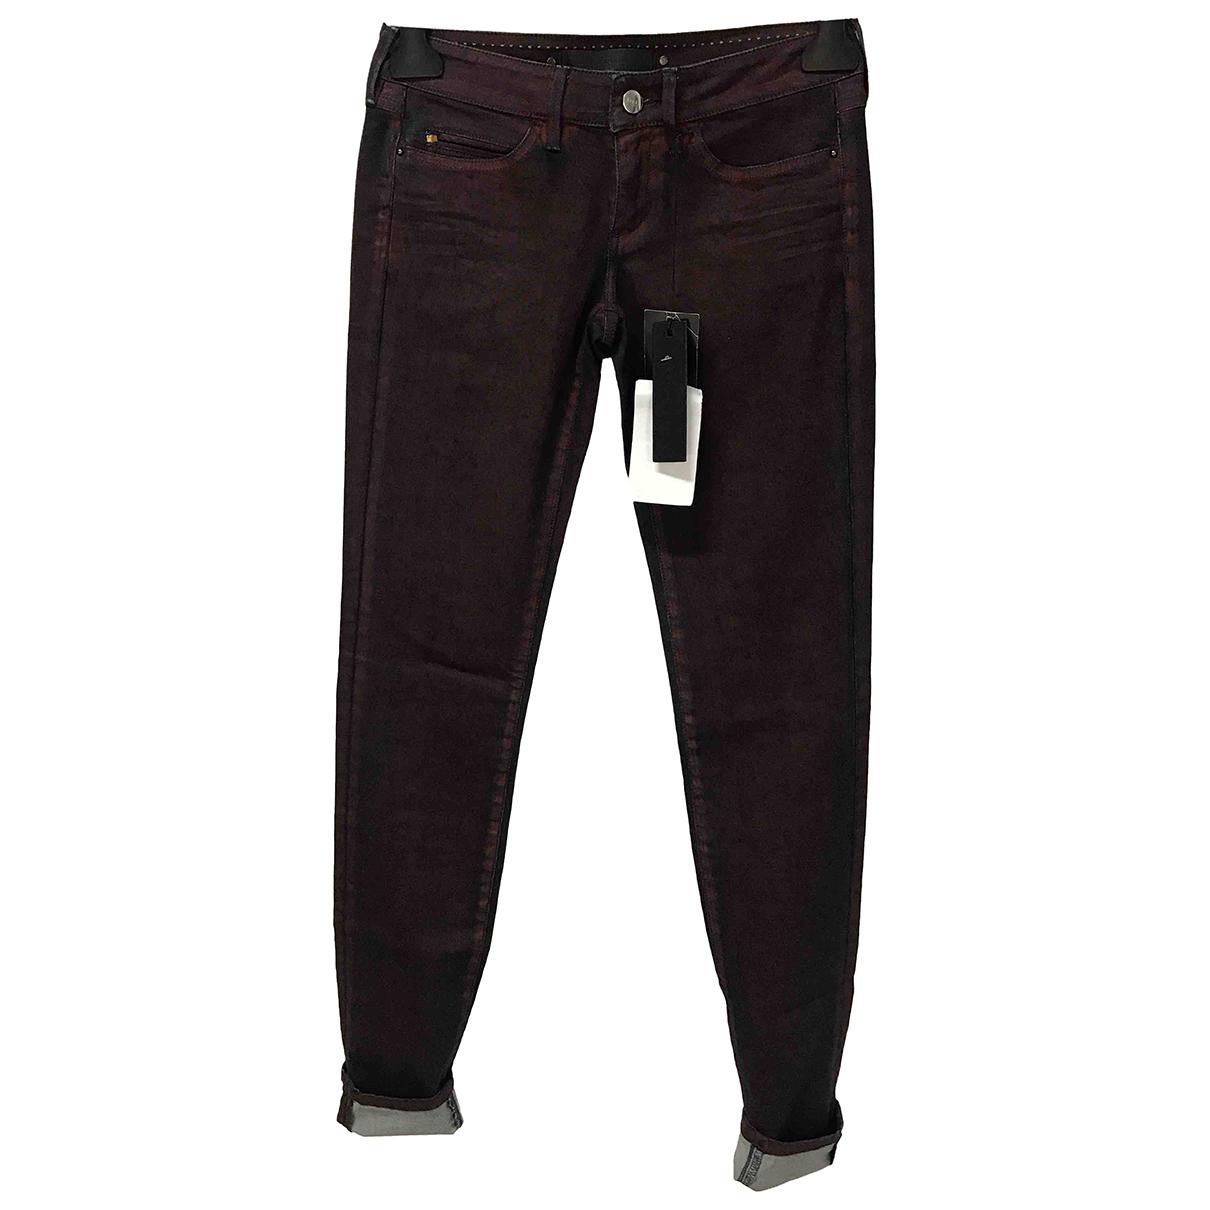 Barbara Bui N Burgundy Cotton - elasthane Jeans for Women 25 US